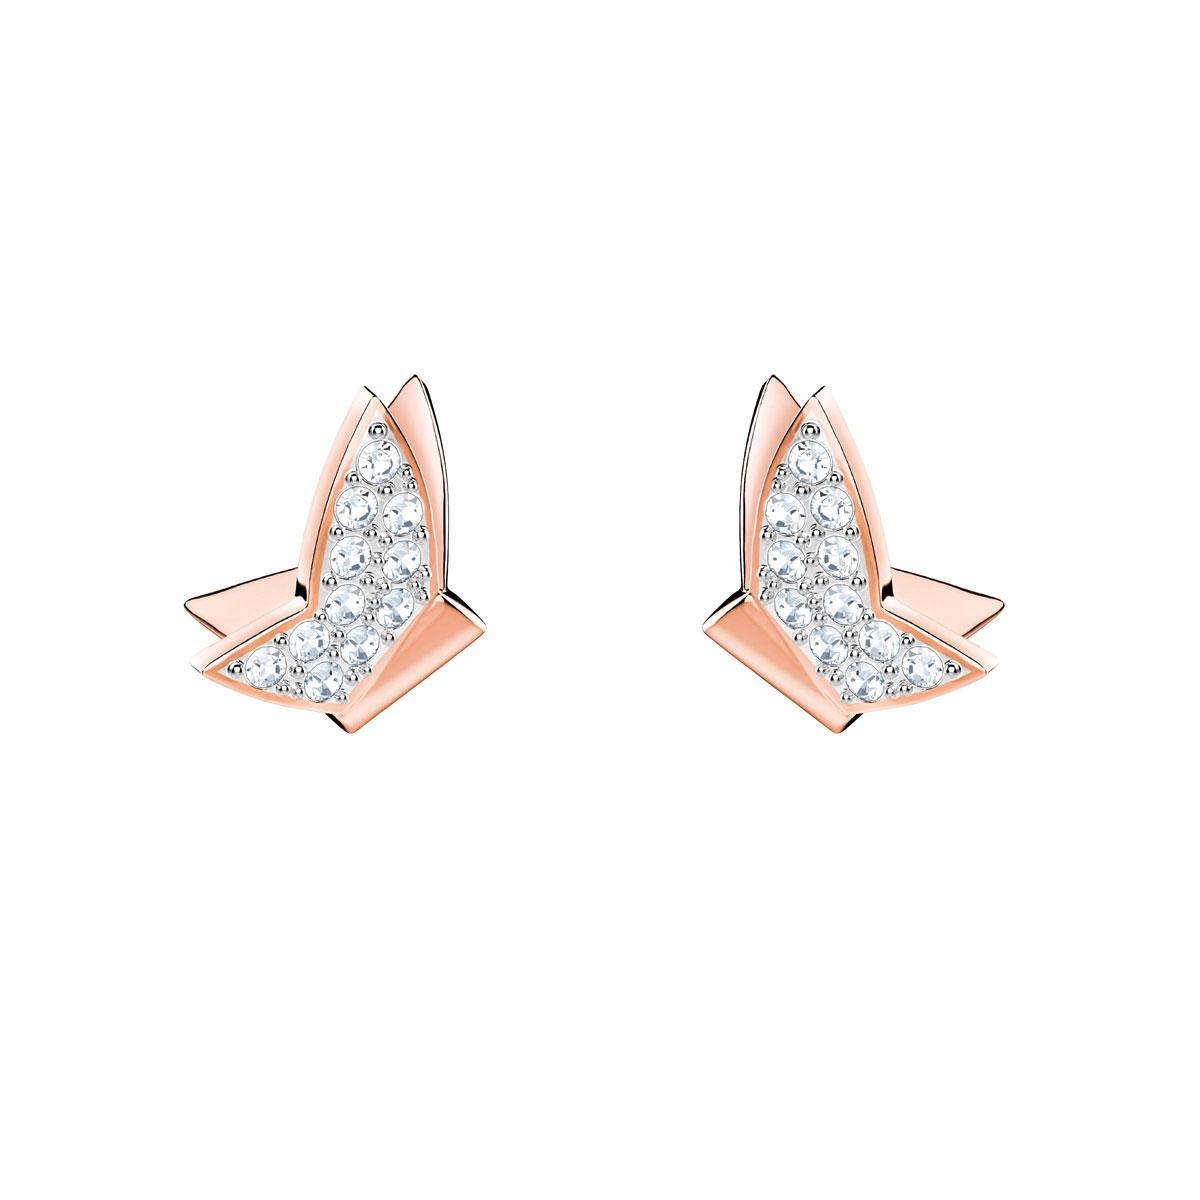 Swarovski Lilia Pierced Earrings, White, Rose Gold